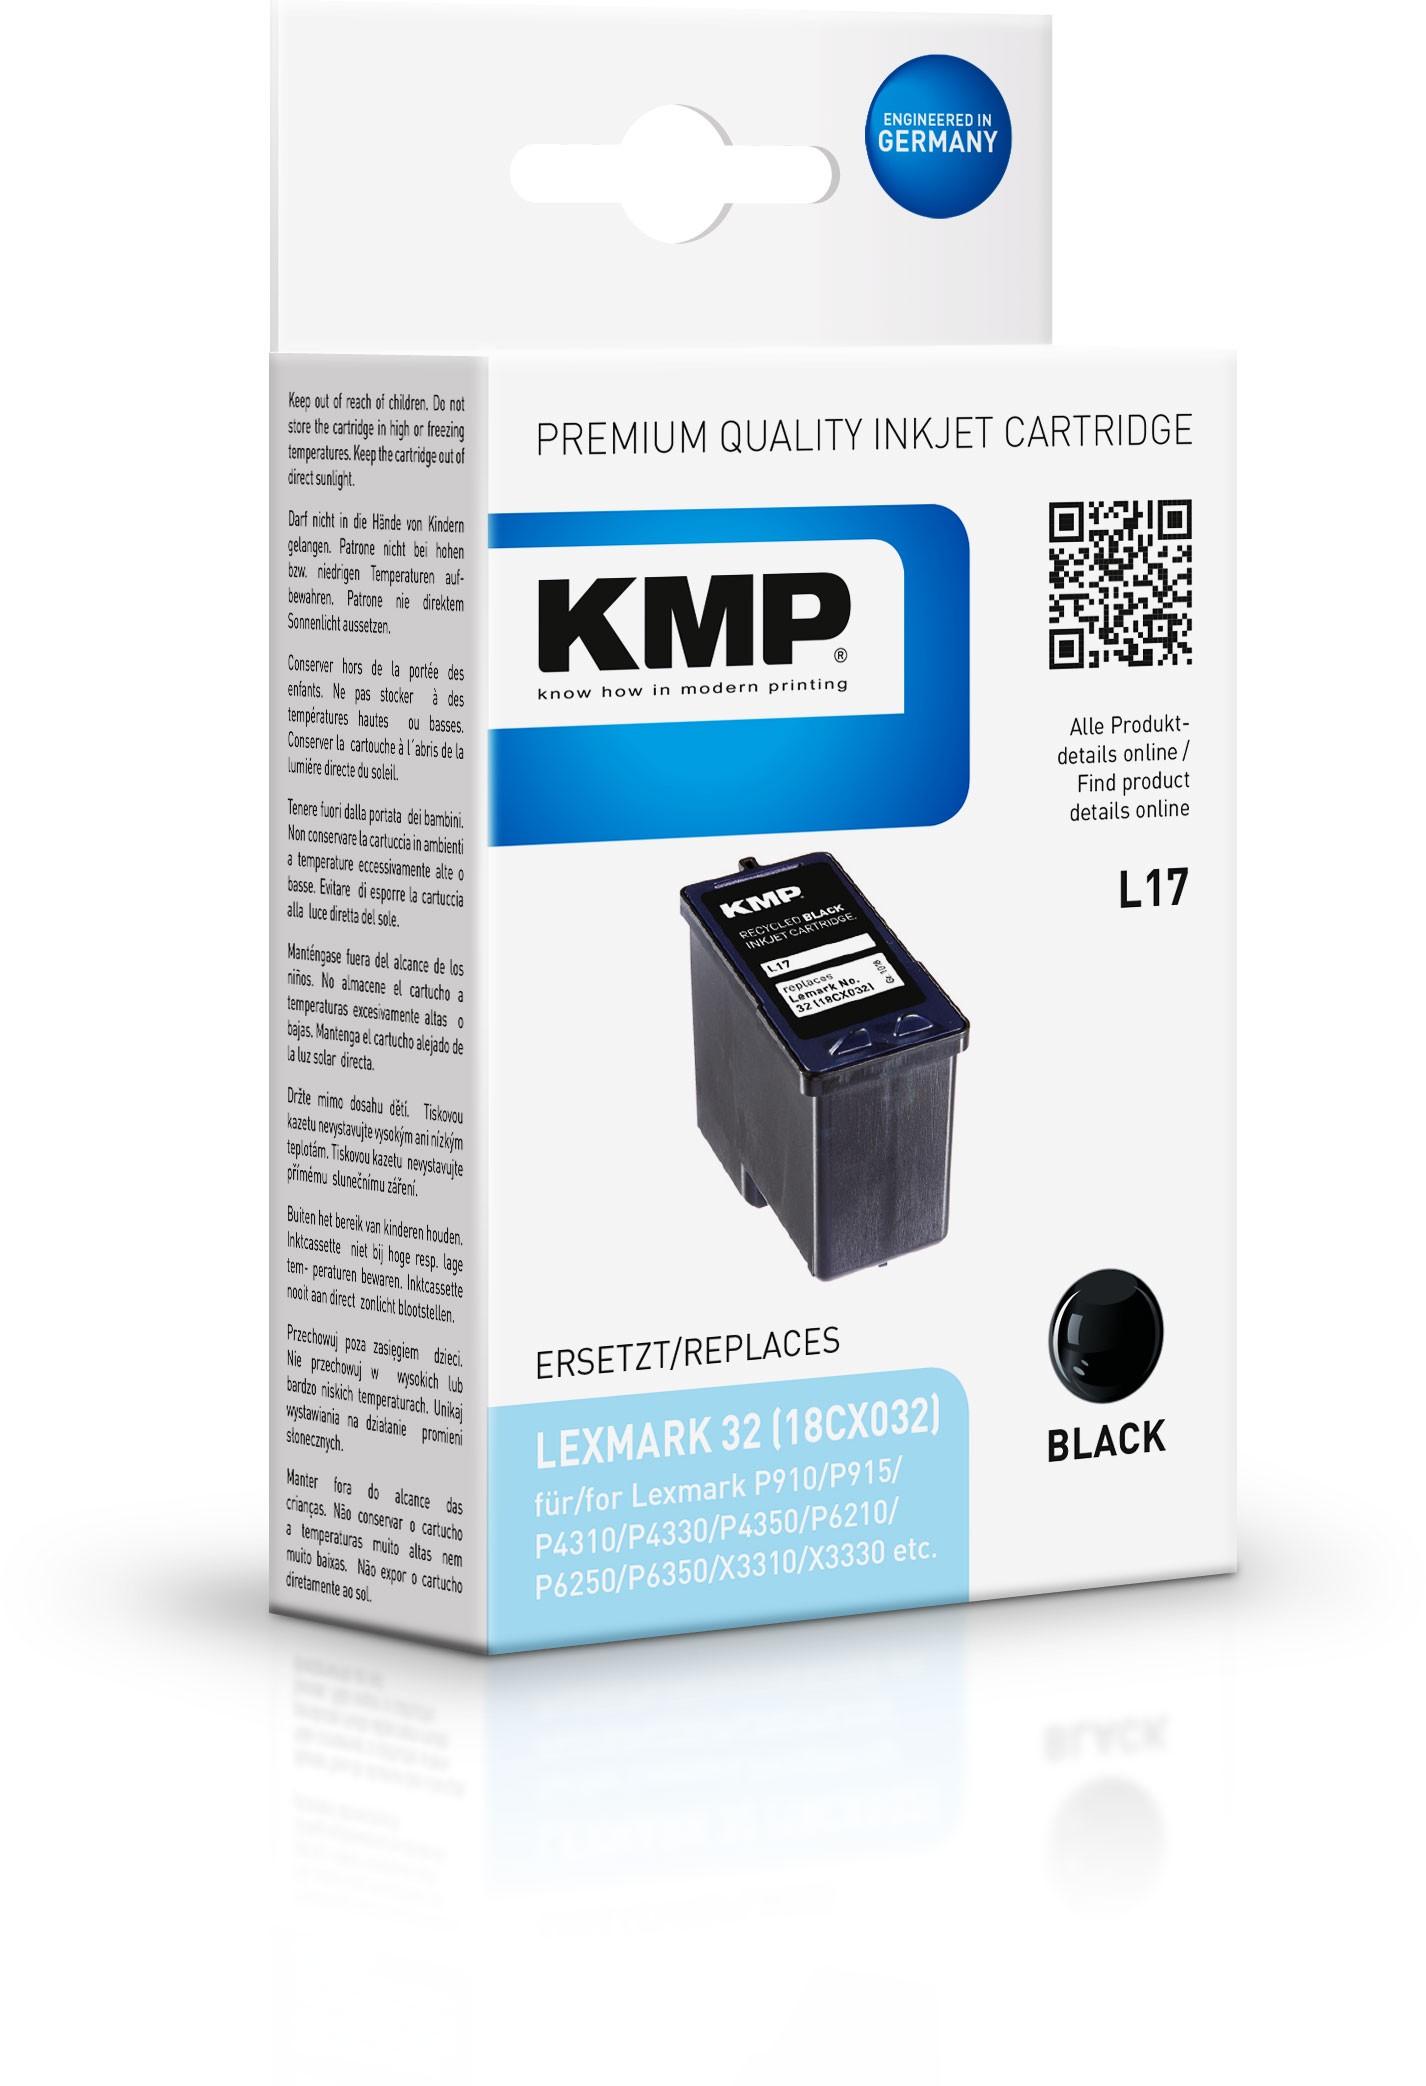 KMP Patrone L17 für Lexmark 18CX032 / Nr. 32 P910 / X3310 / 810 schwarz